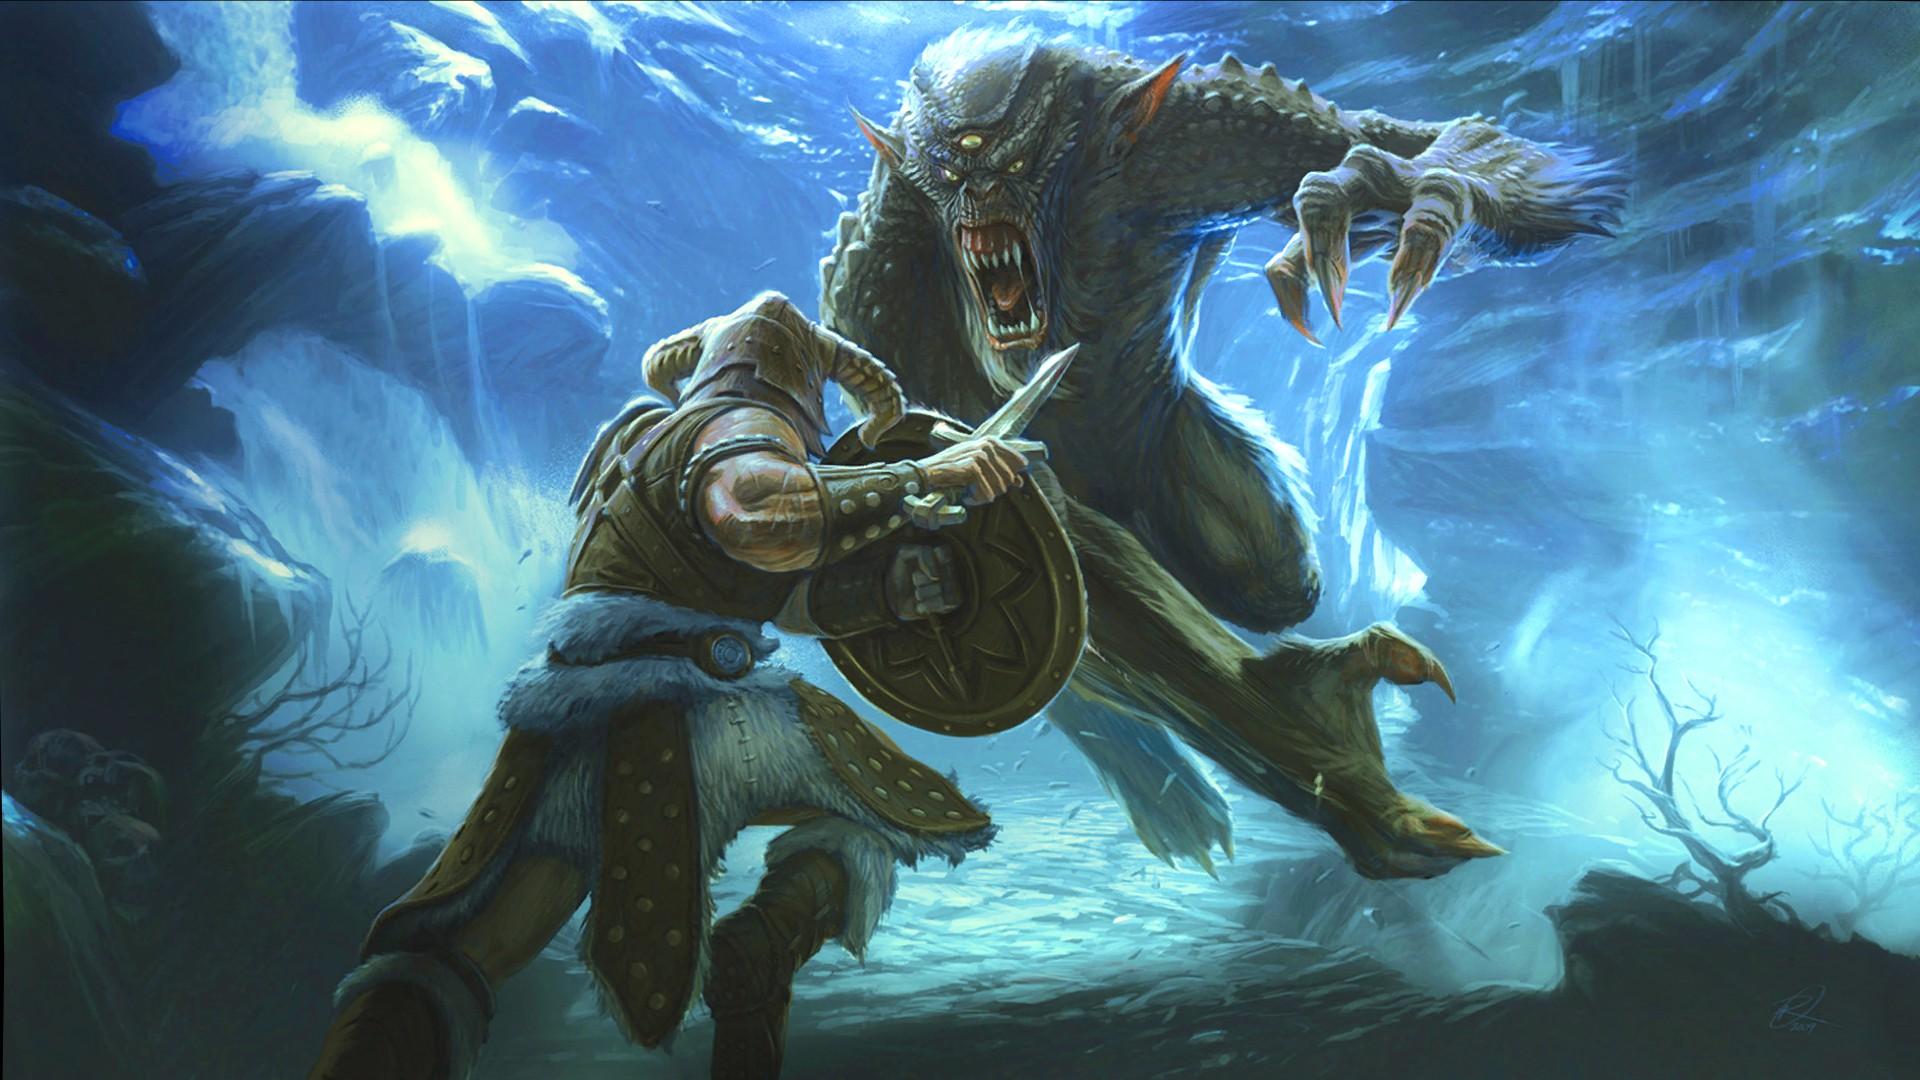 72850_screenshots_20160519120227_1.jpg - Elder Scrolls 5: Skyrim, the